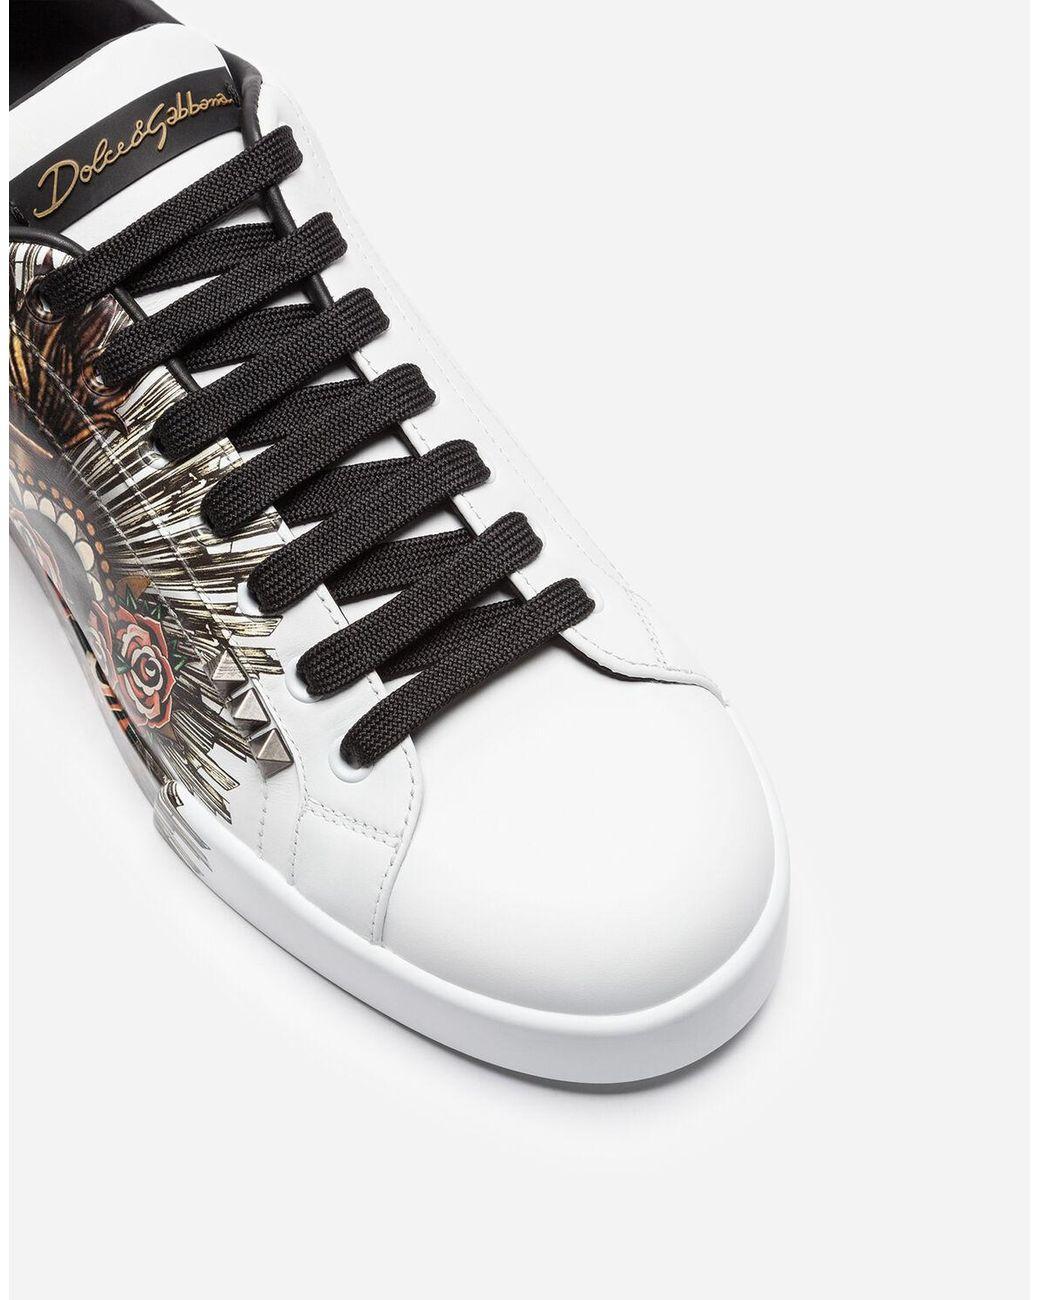 Printed Calfskin Portofino Sneakers